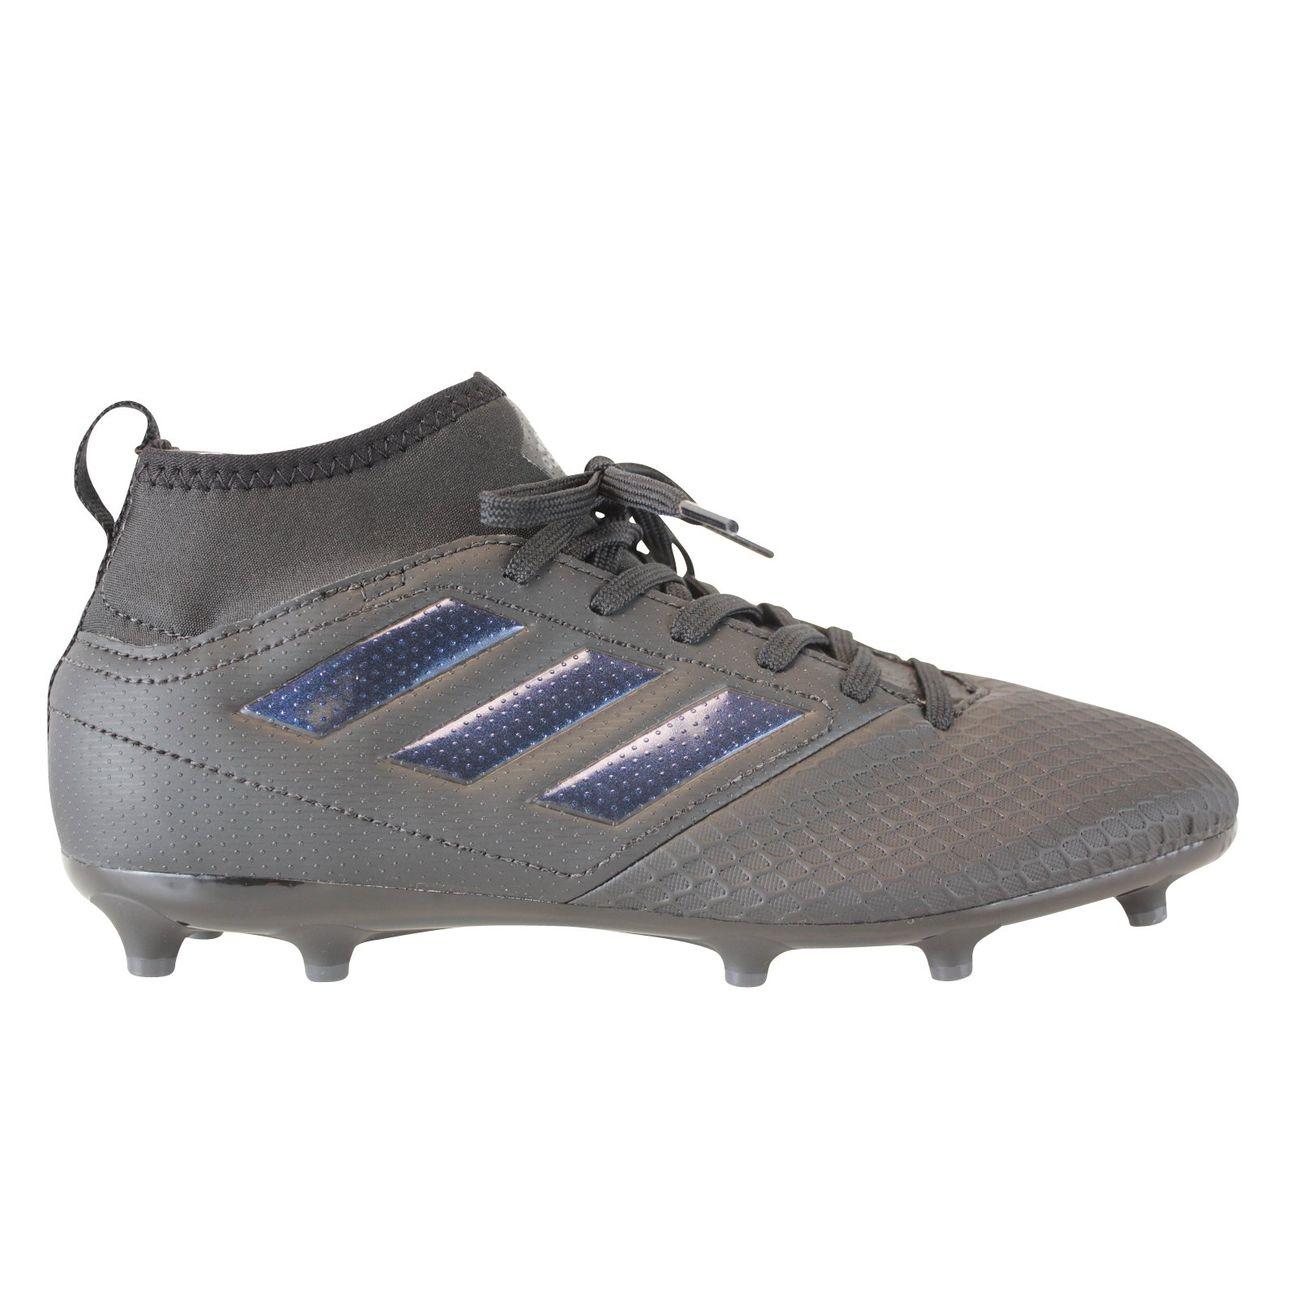 Adidas Performance Ace 17.3 Fg noir, chaussures de football